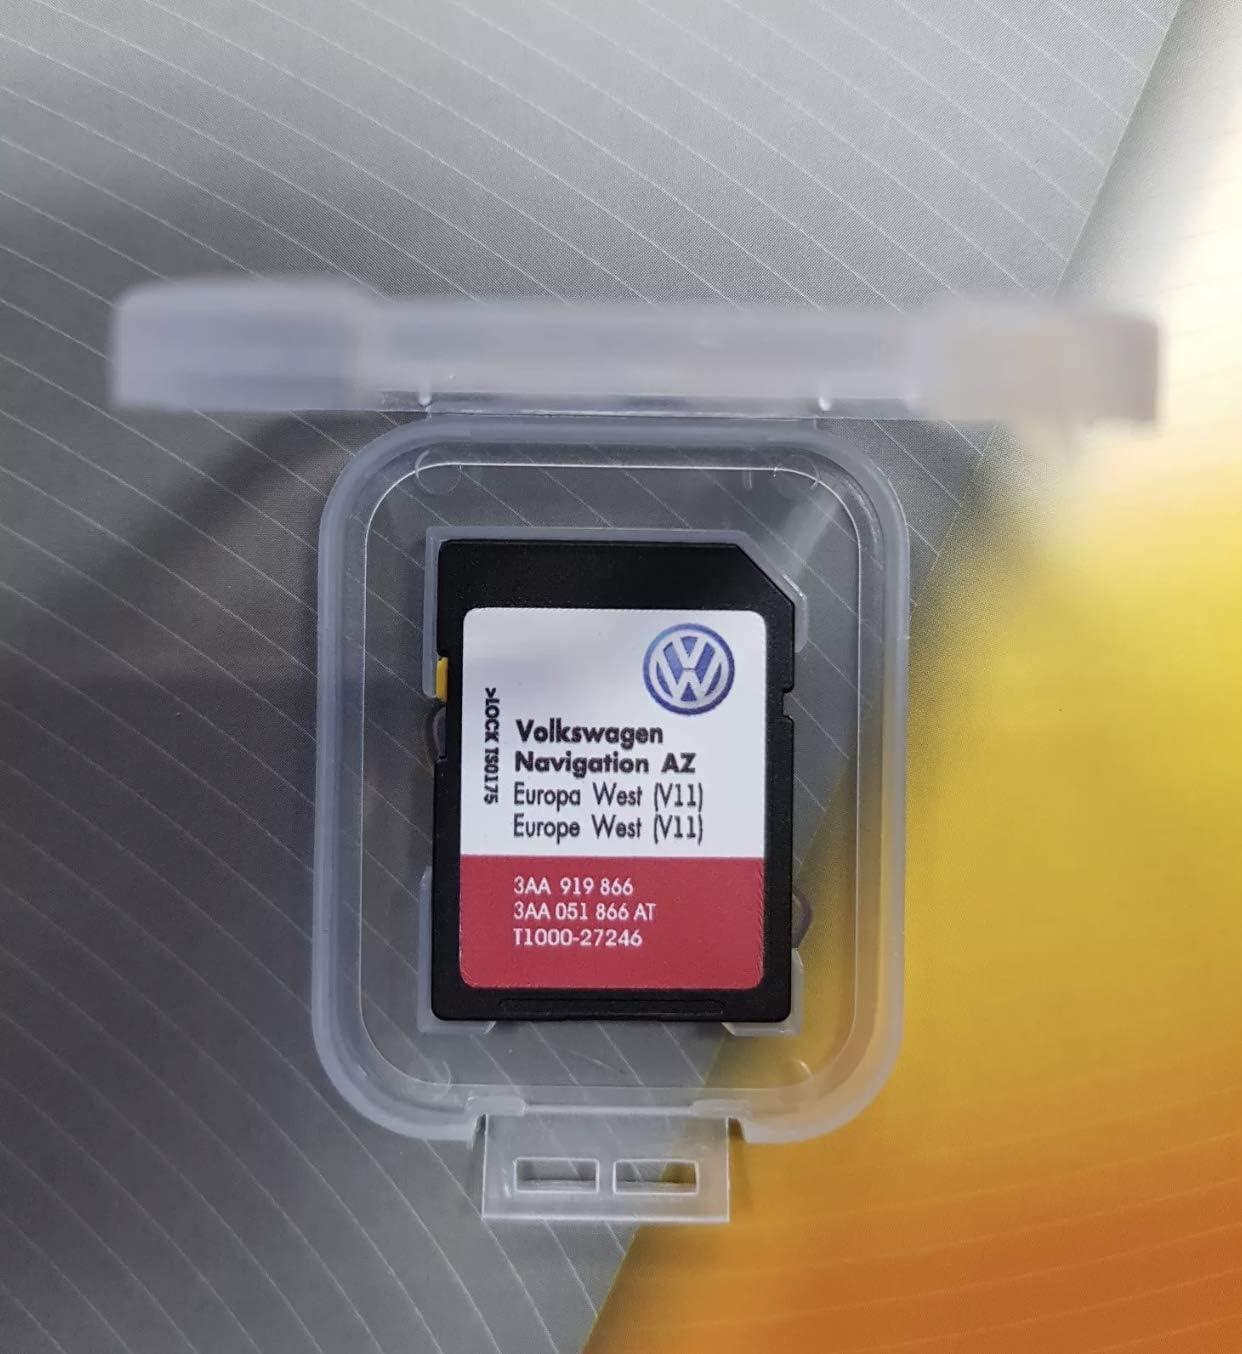 Volkswagen 3aa051866at Original Sd Karte Navigation V11 Elektronik